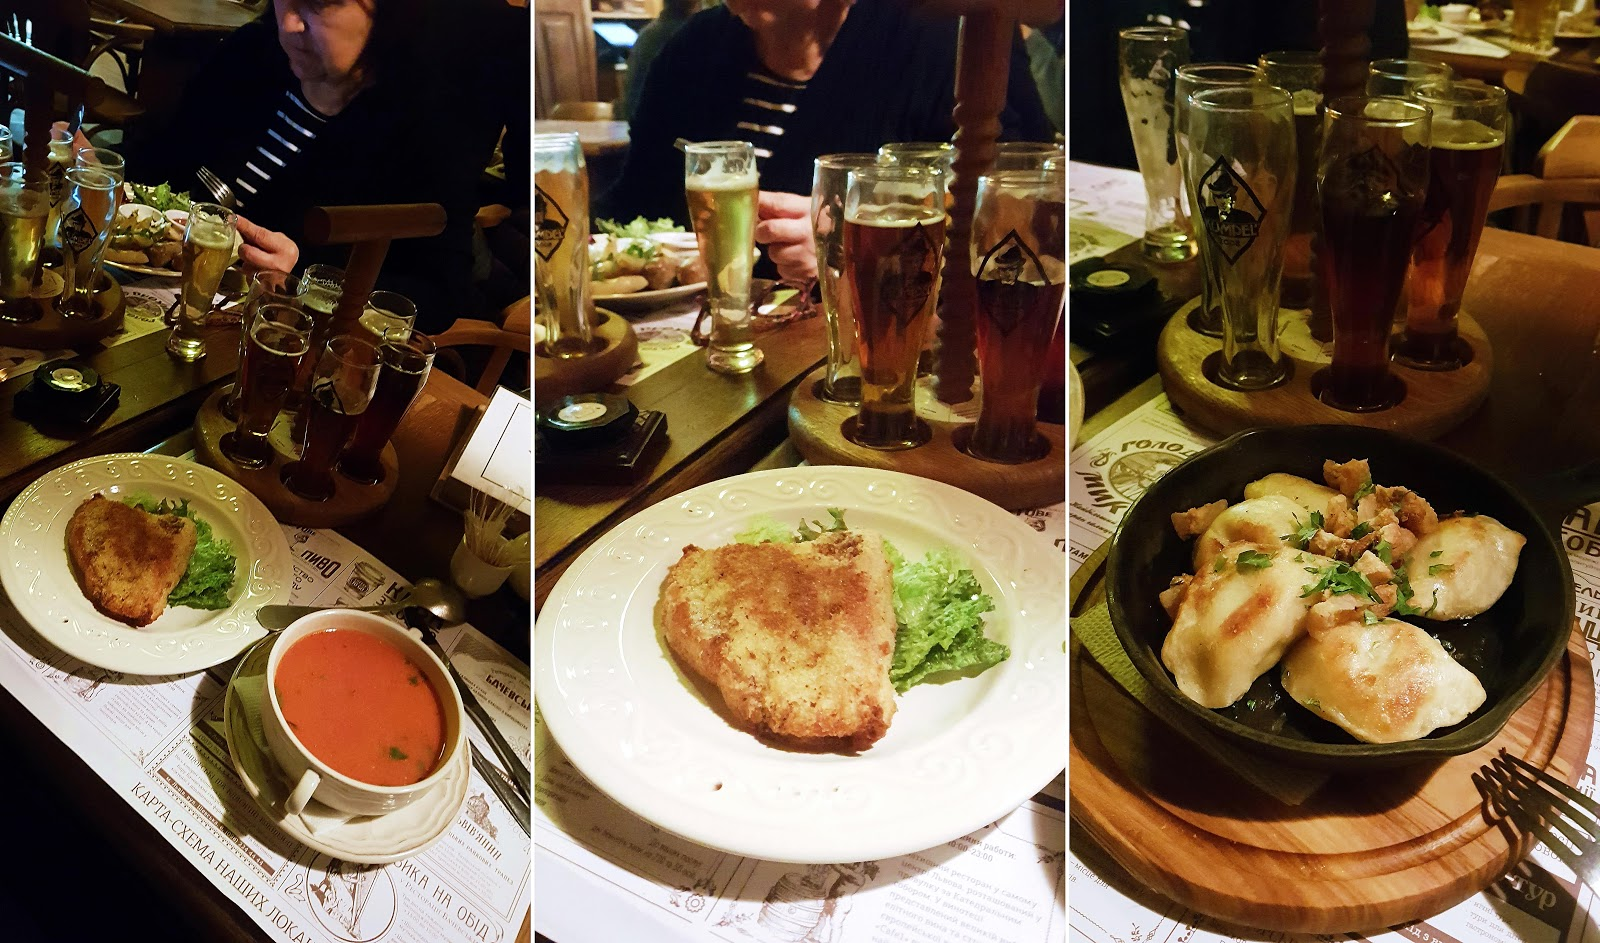 kolacja kumpel lwów